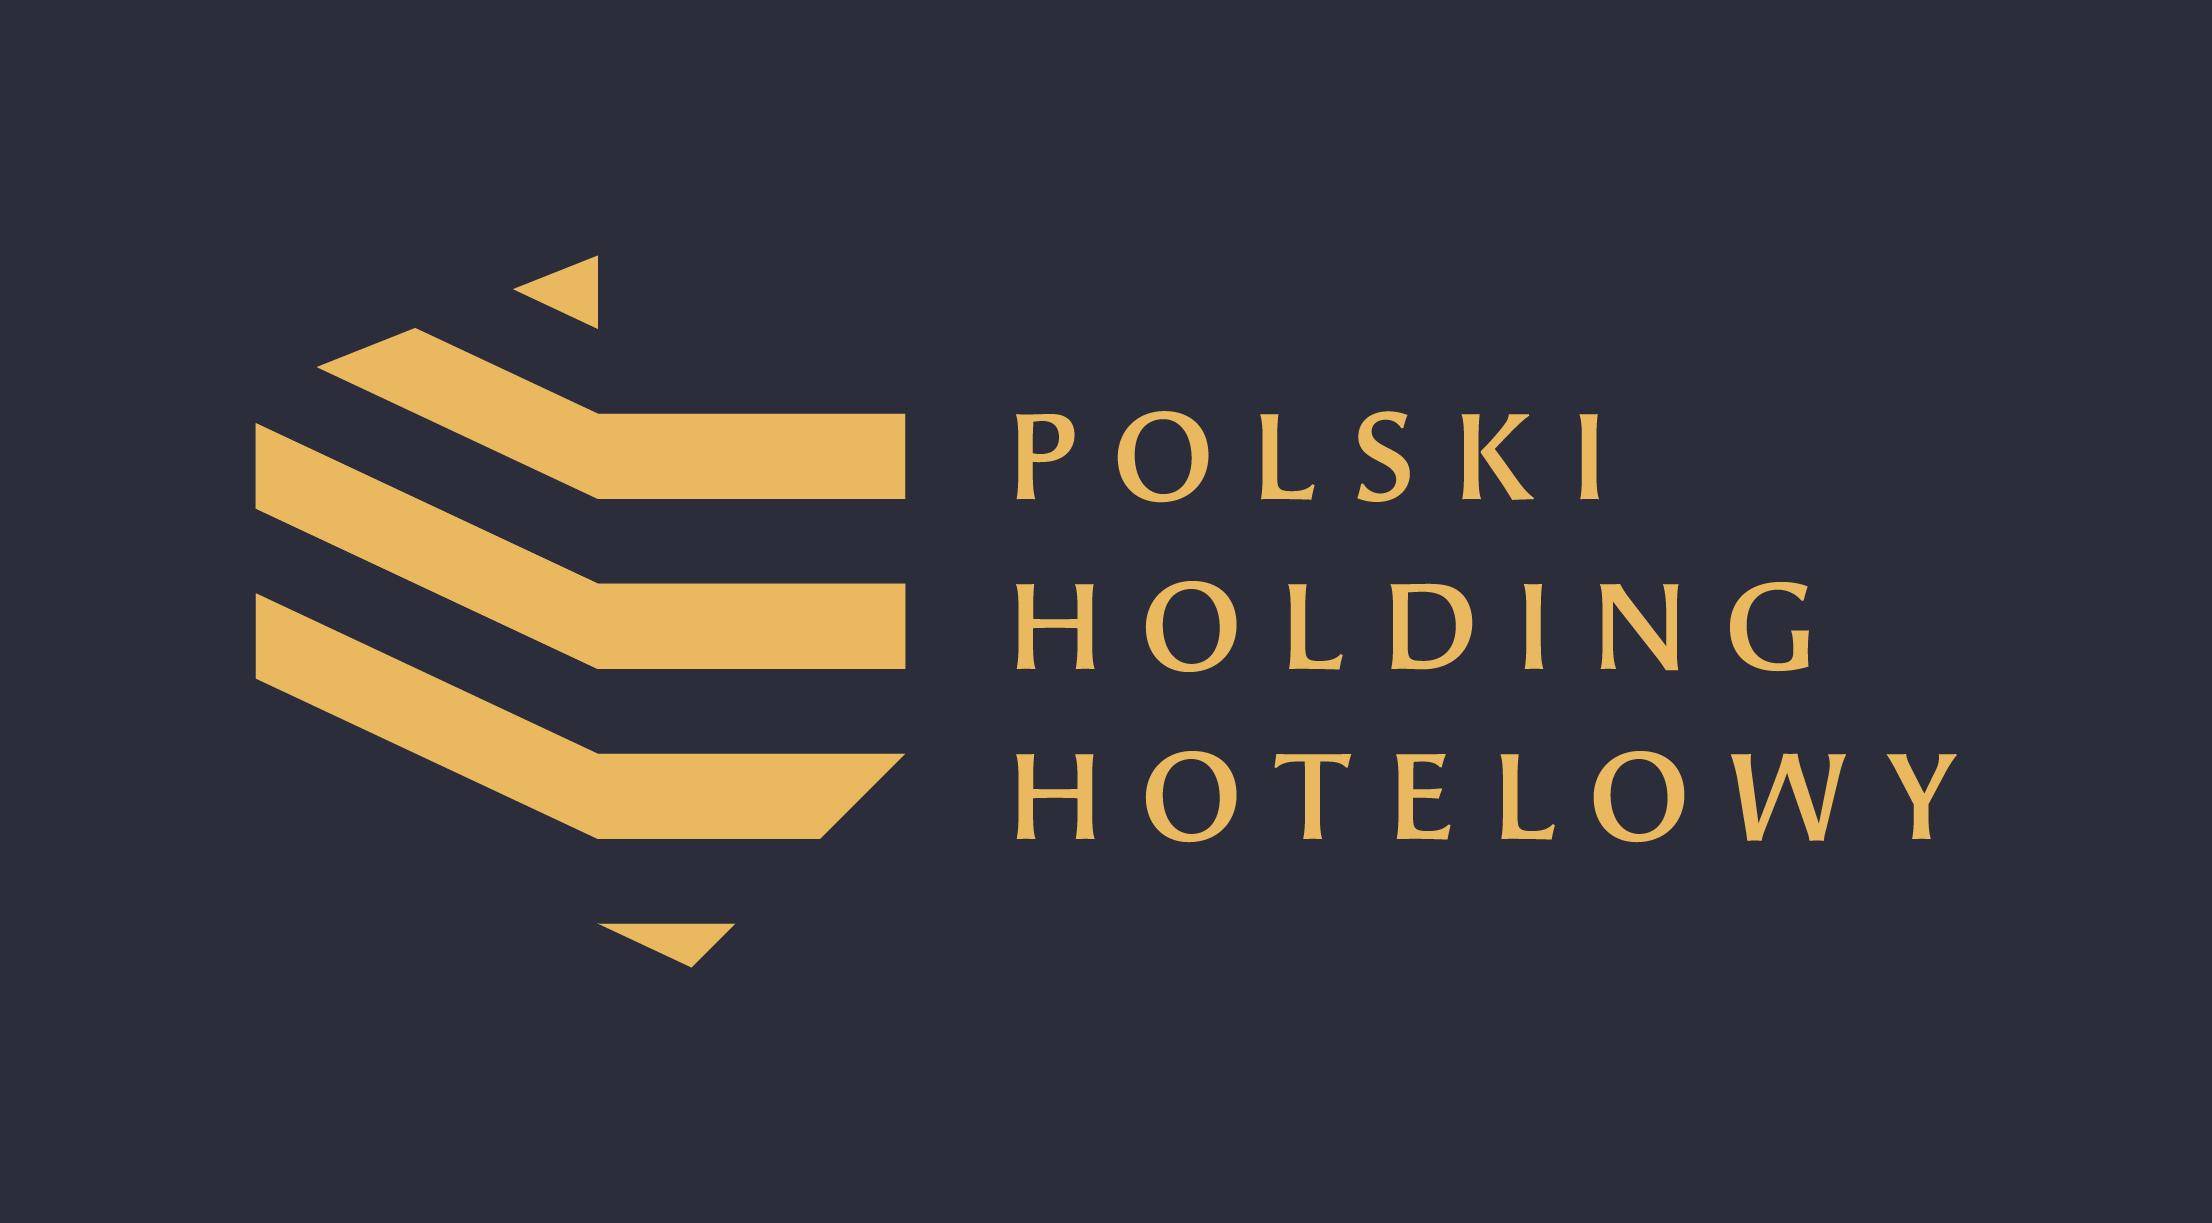 Polski Holding Hotelowy